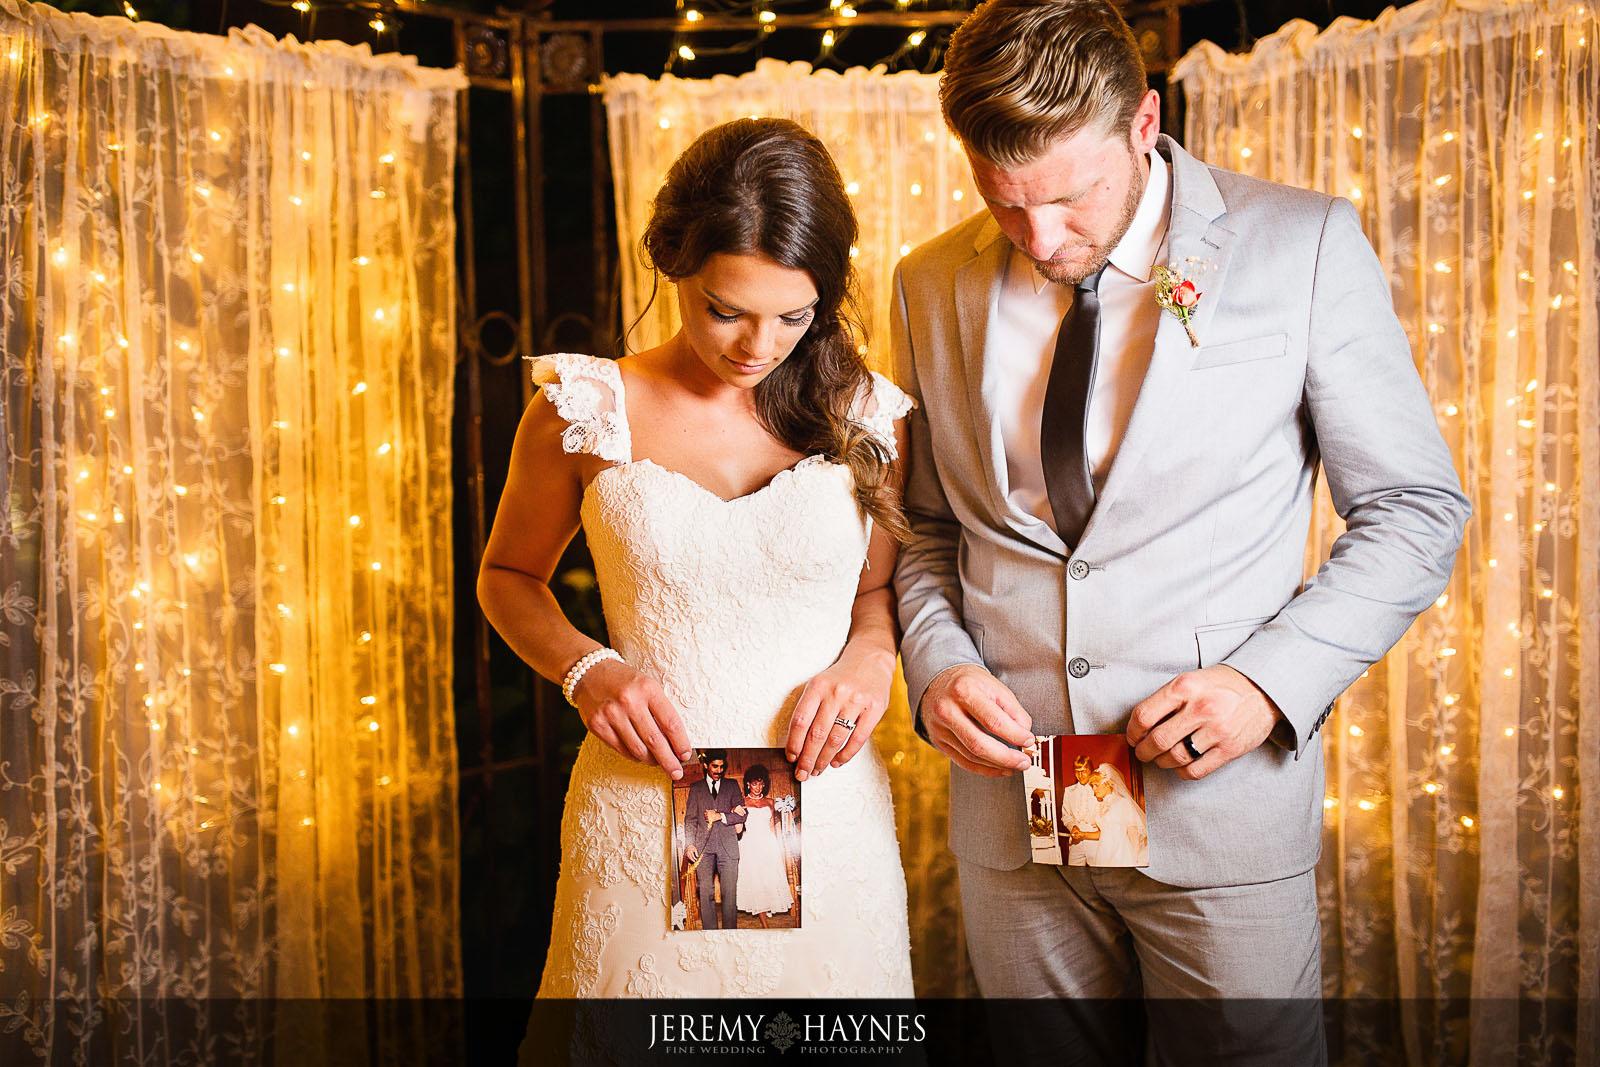 starlit-wedding-couple